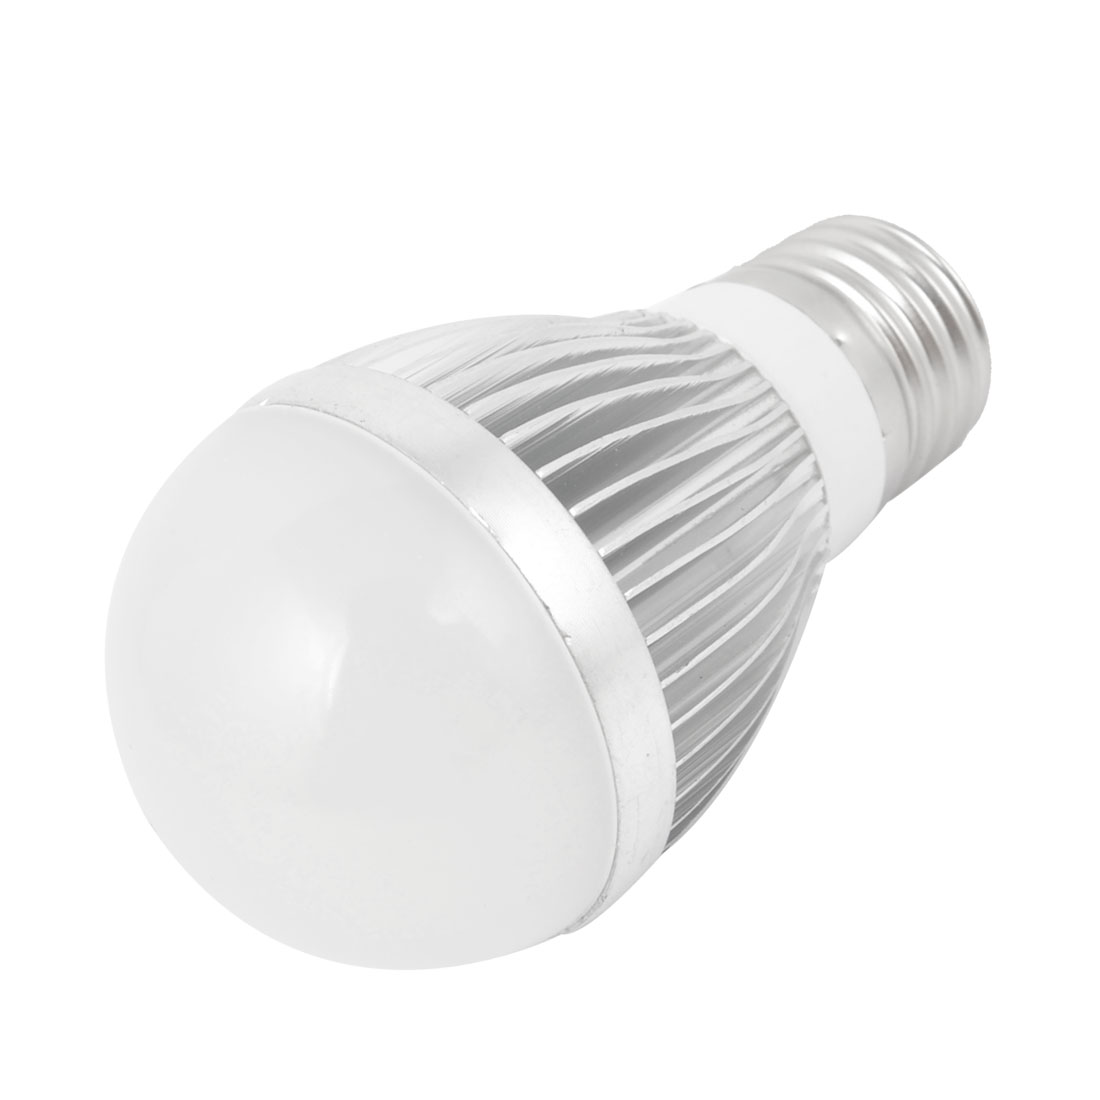 Warm White 7W E27 Screw Base 5730 SMD 15-LED Spotlight Bulb Lamp AC 85-265V